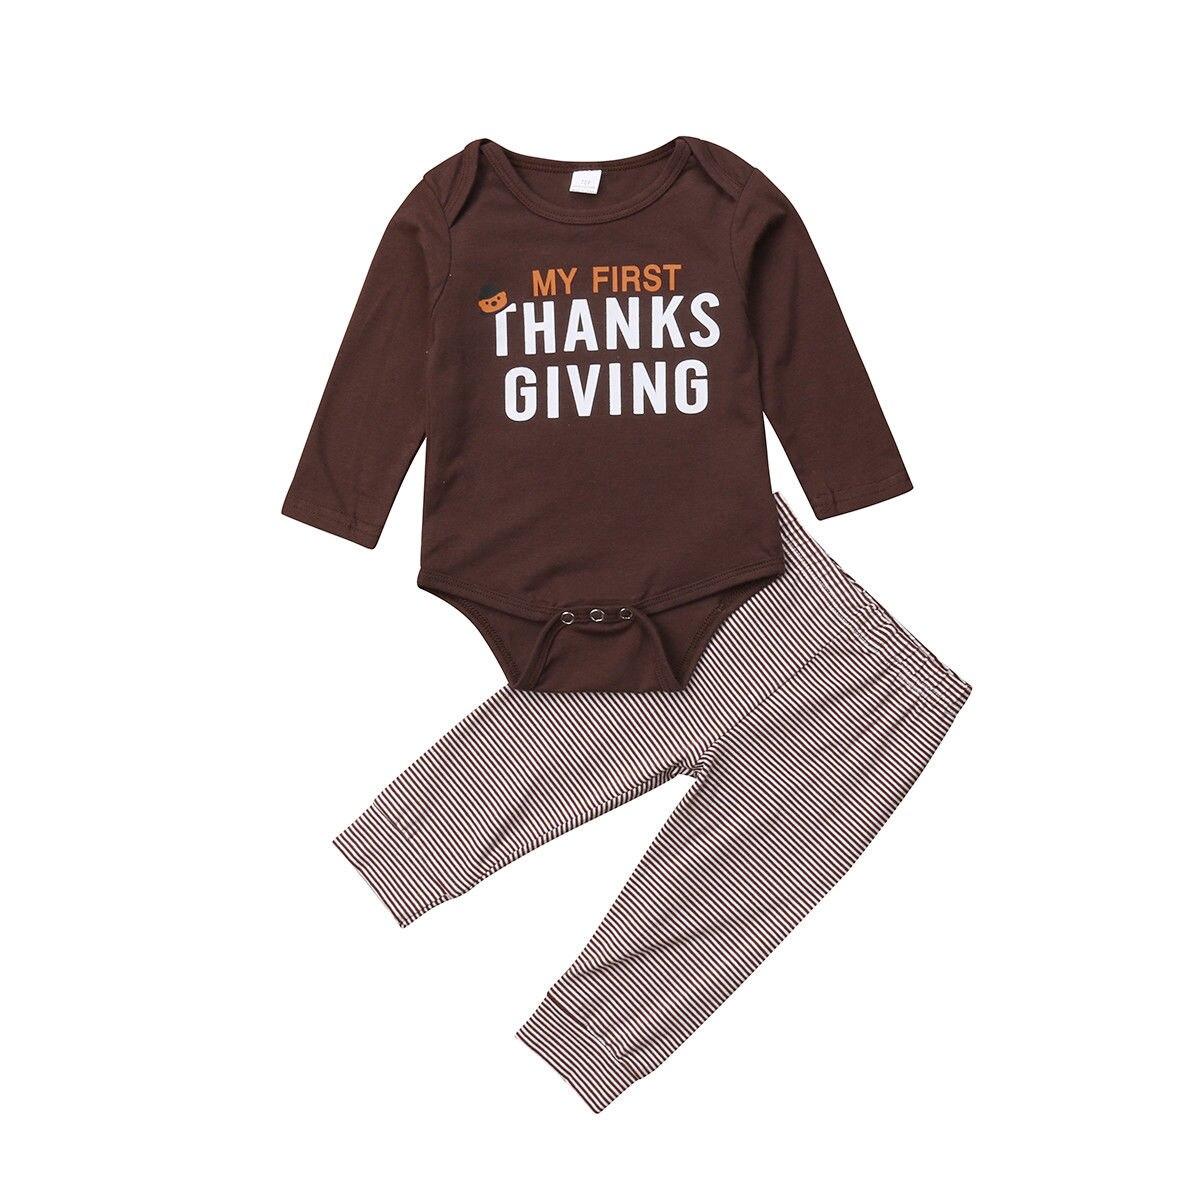 Pants Outfit 2pcs Set Toddler Baby Girl Thanksgiving Turkey Long Sleeve T-shirt